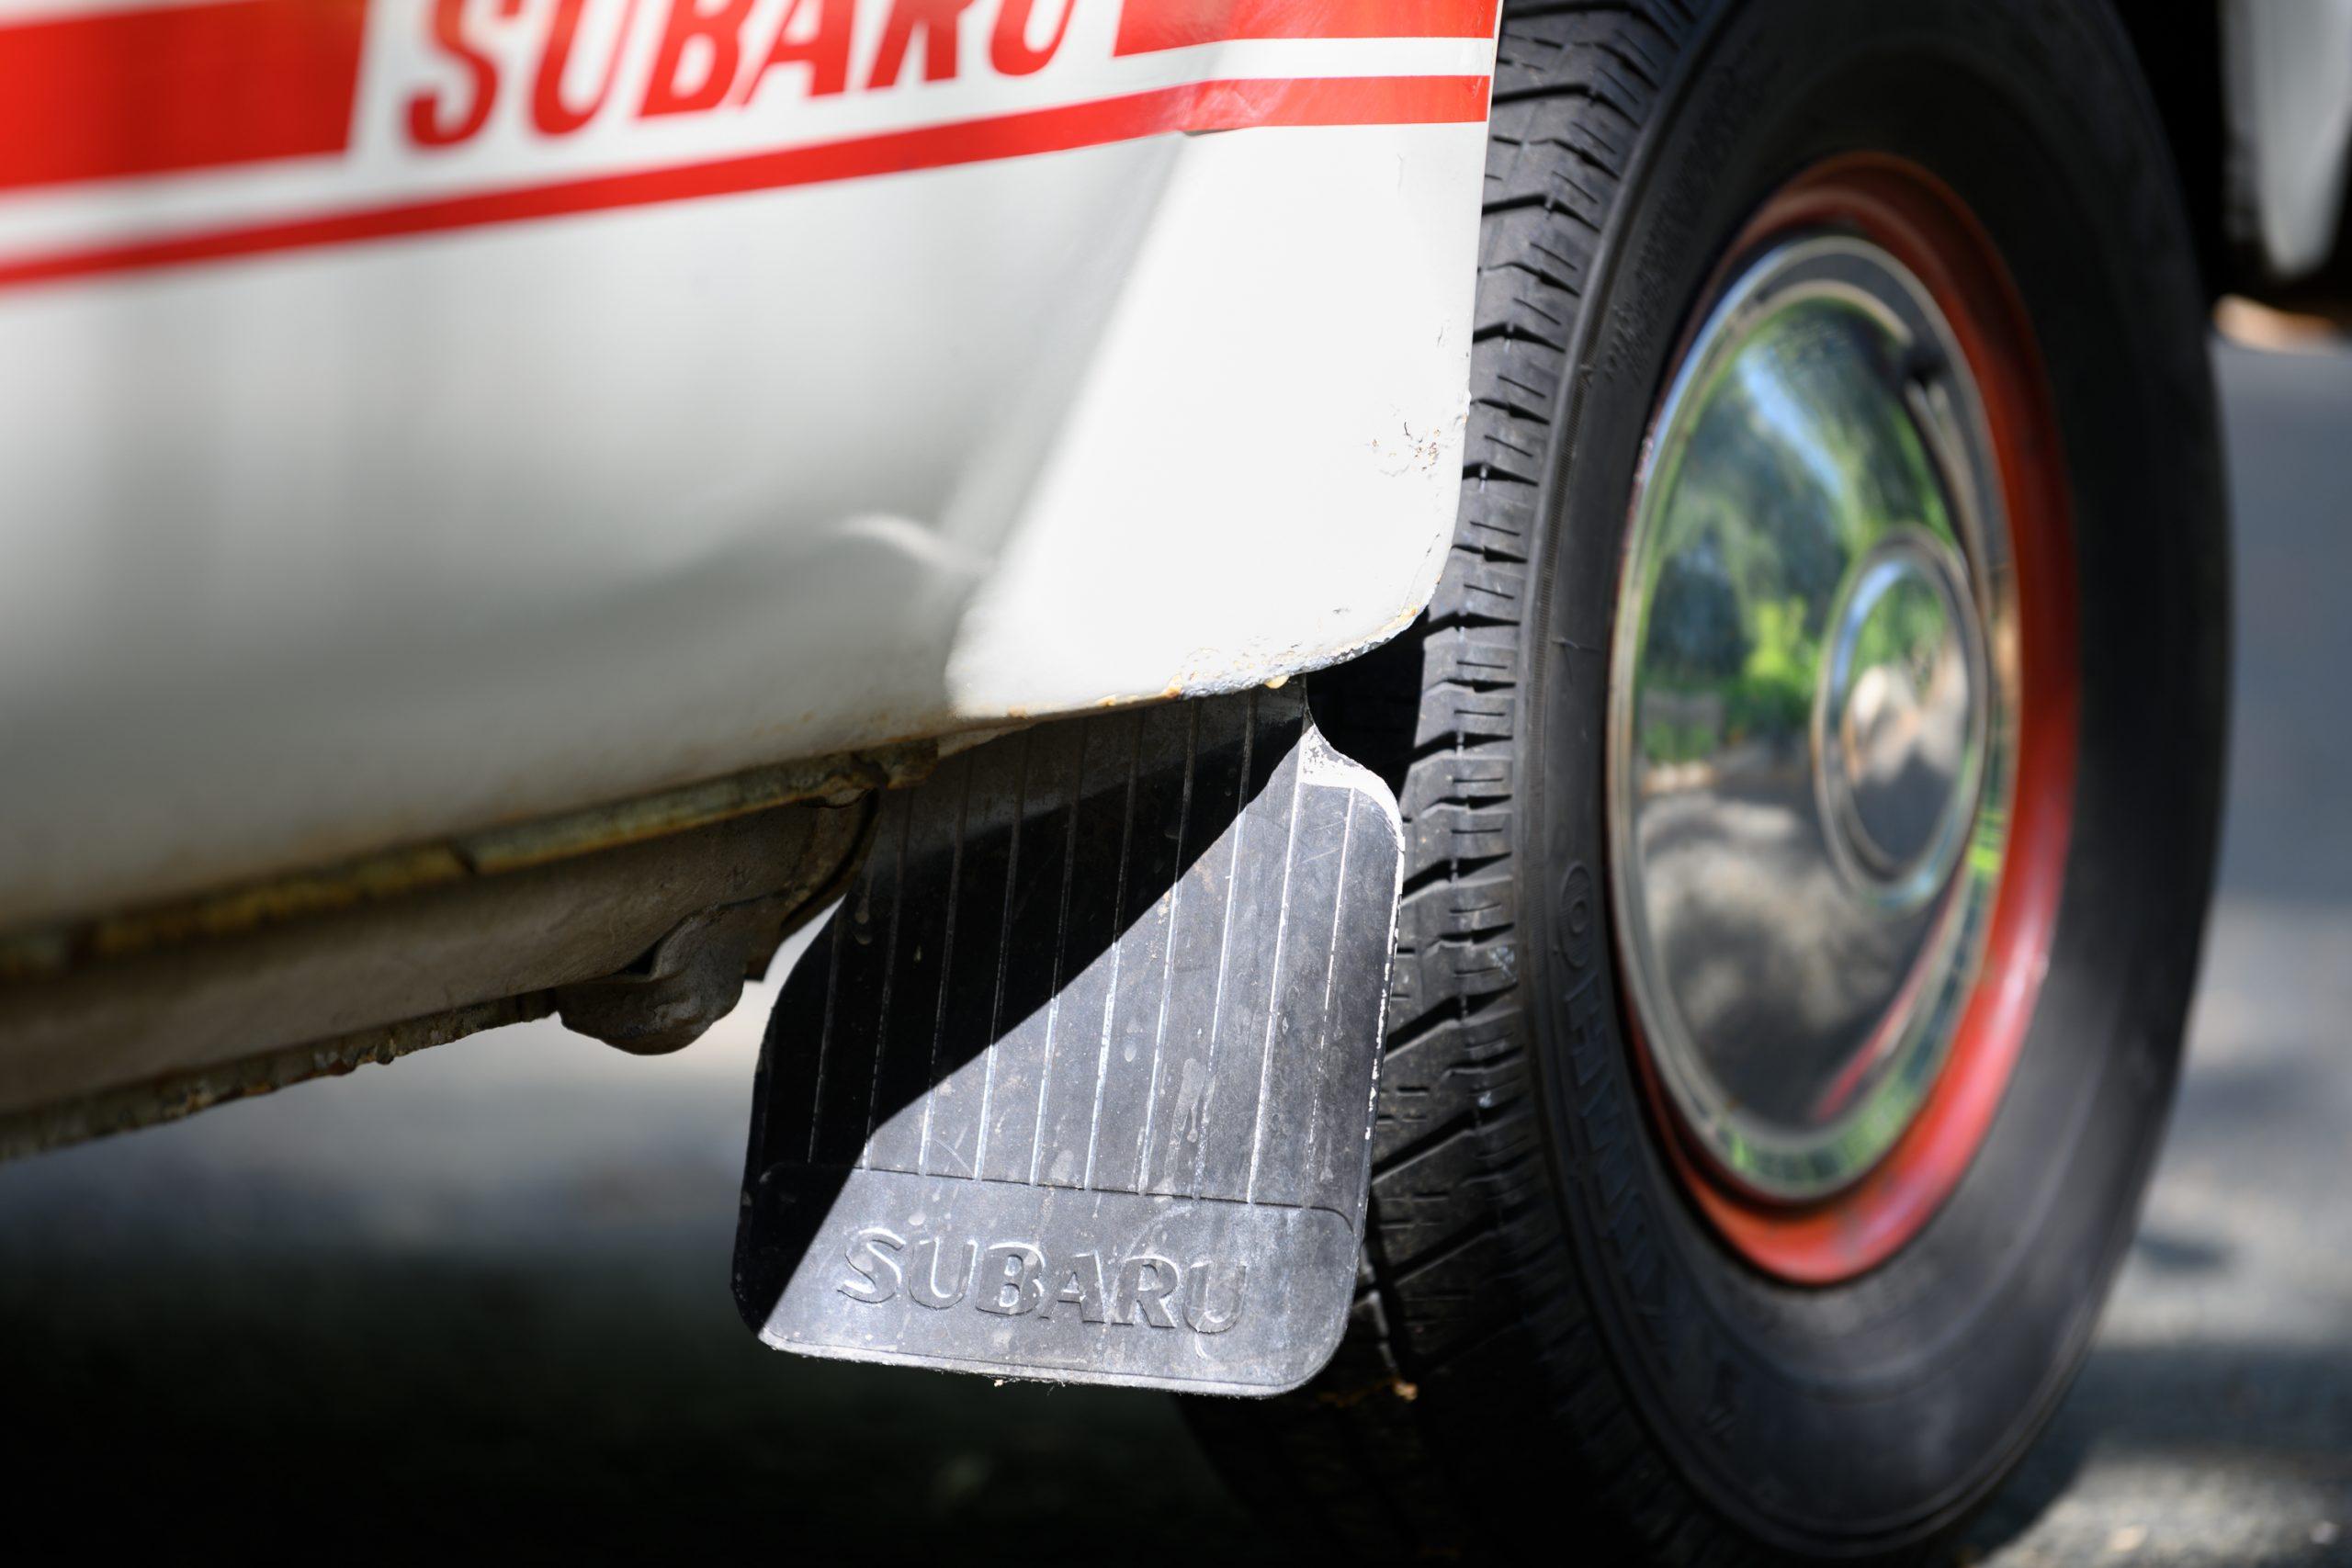 Subaru 360 mudflap detail